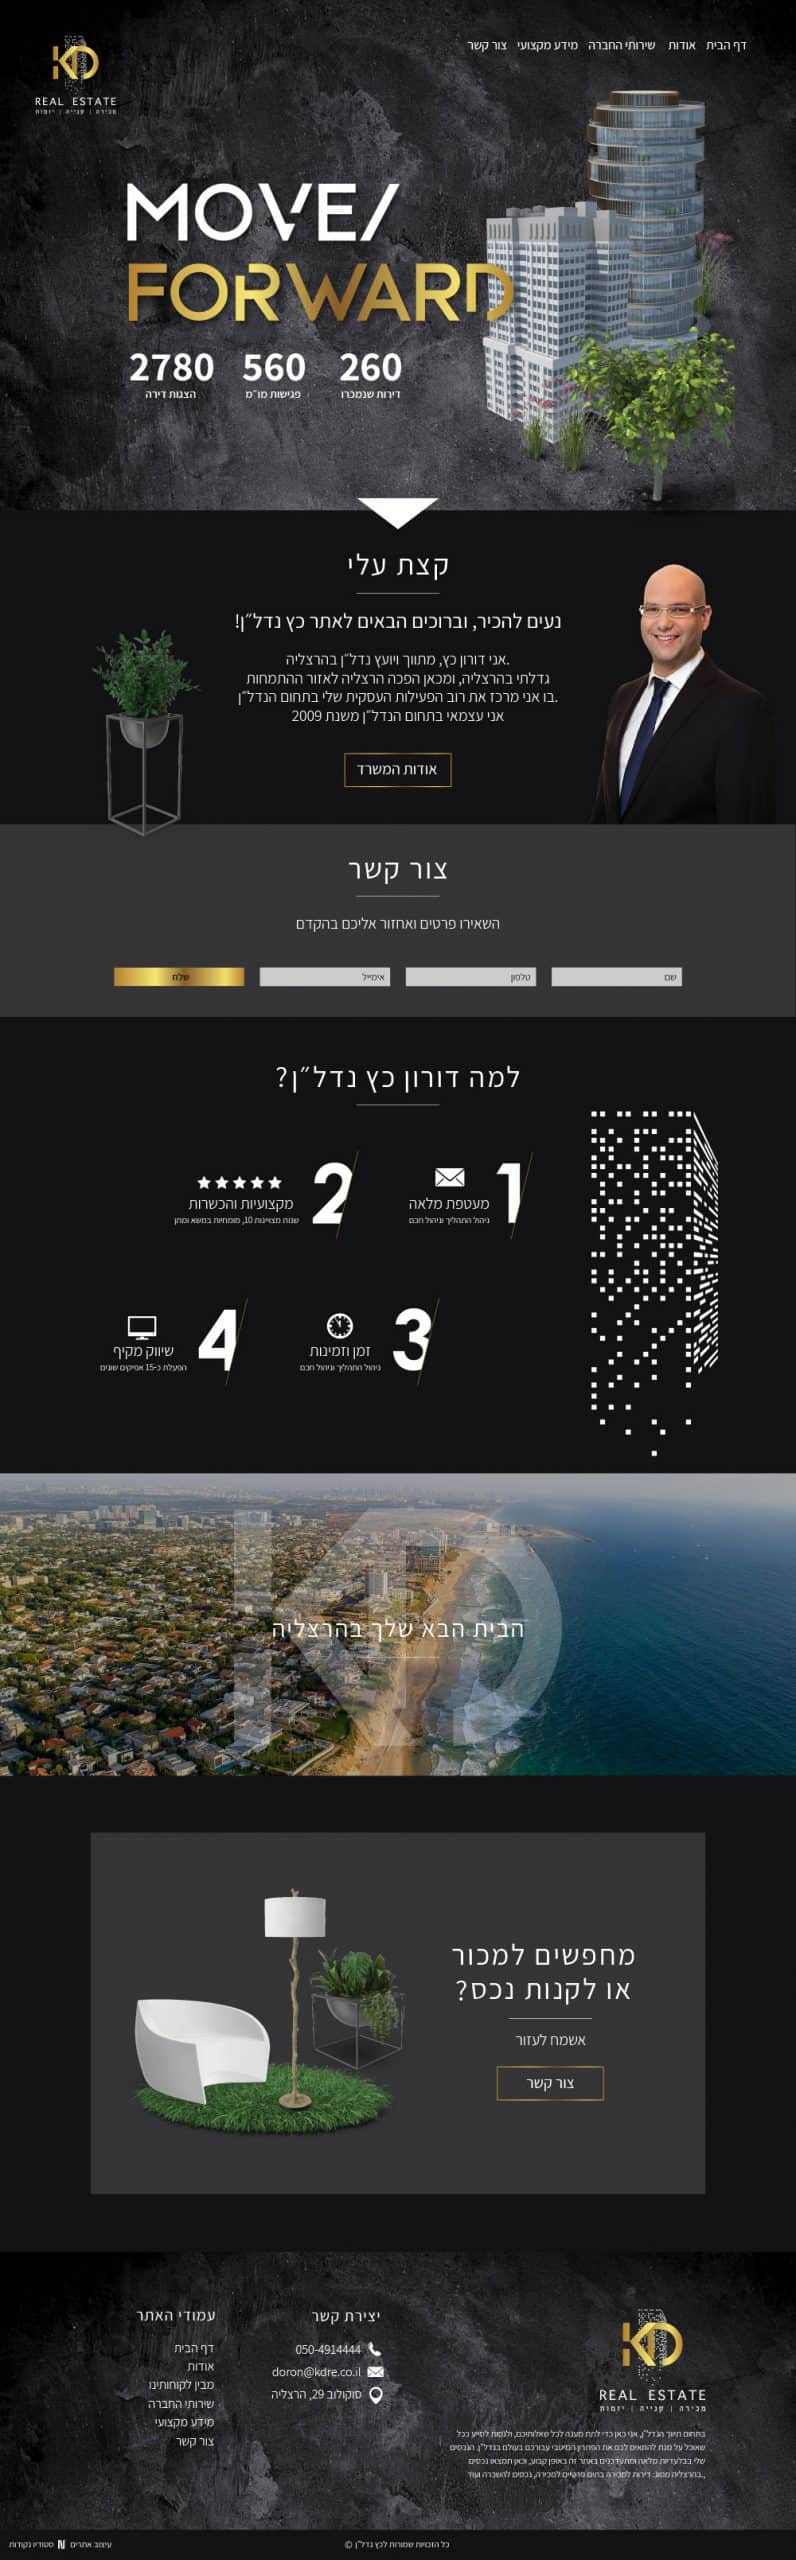 Homepage-copy